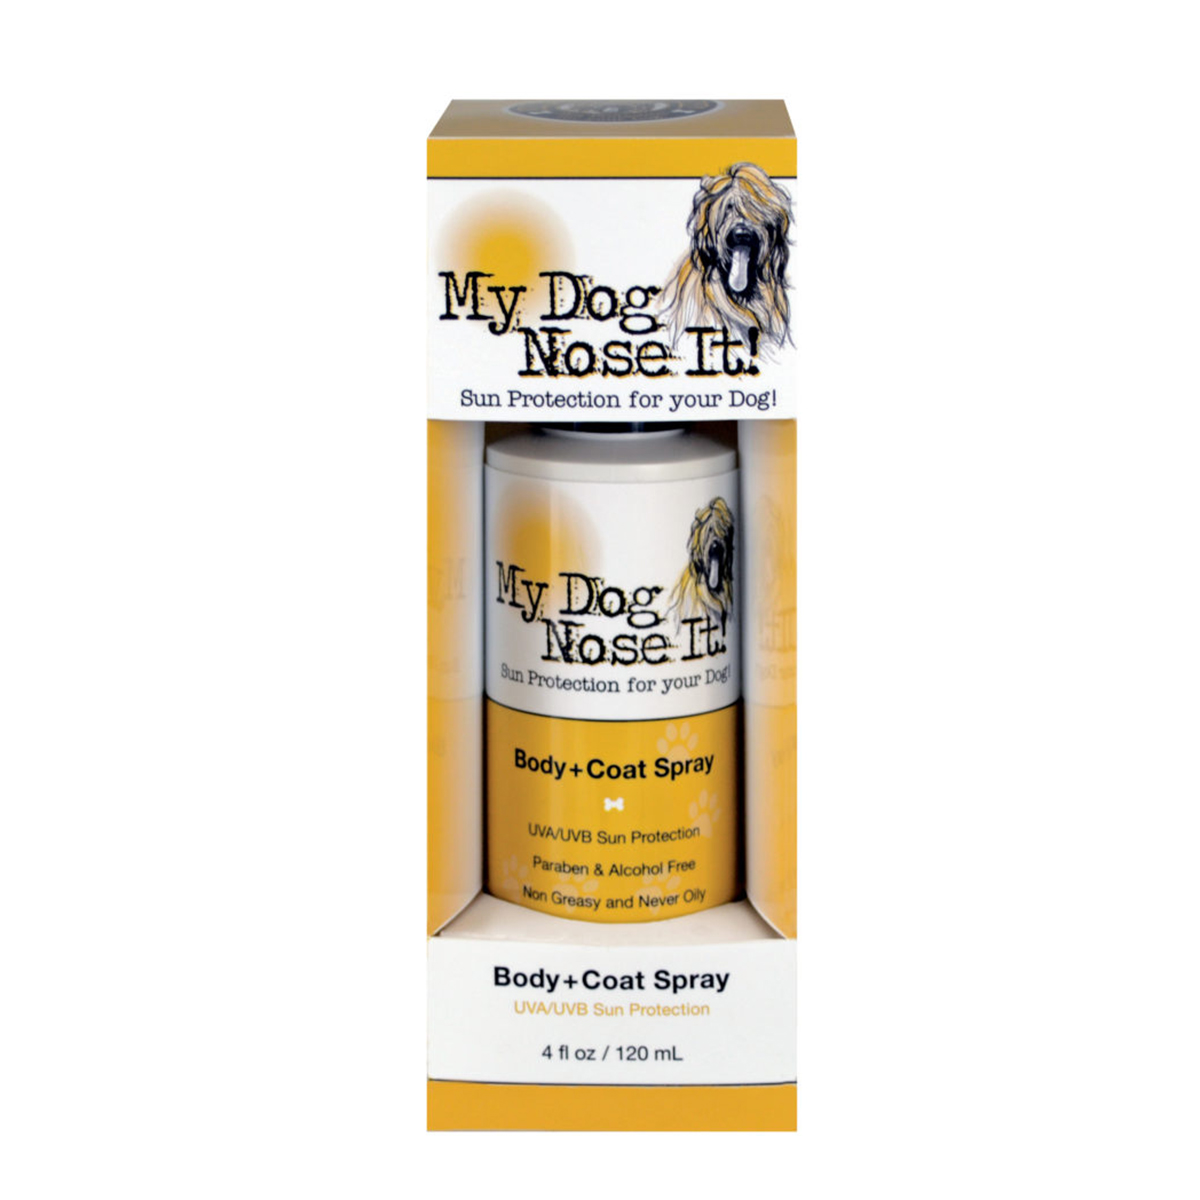 My Dog Nose It Body Coat Spray Dog Sun Protection